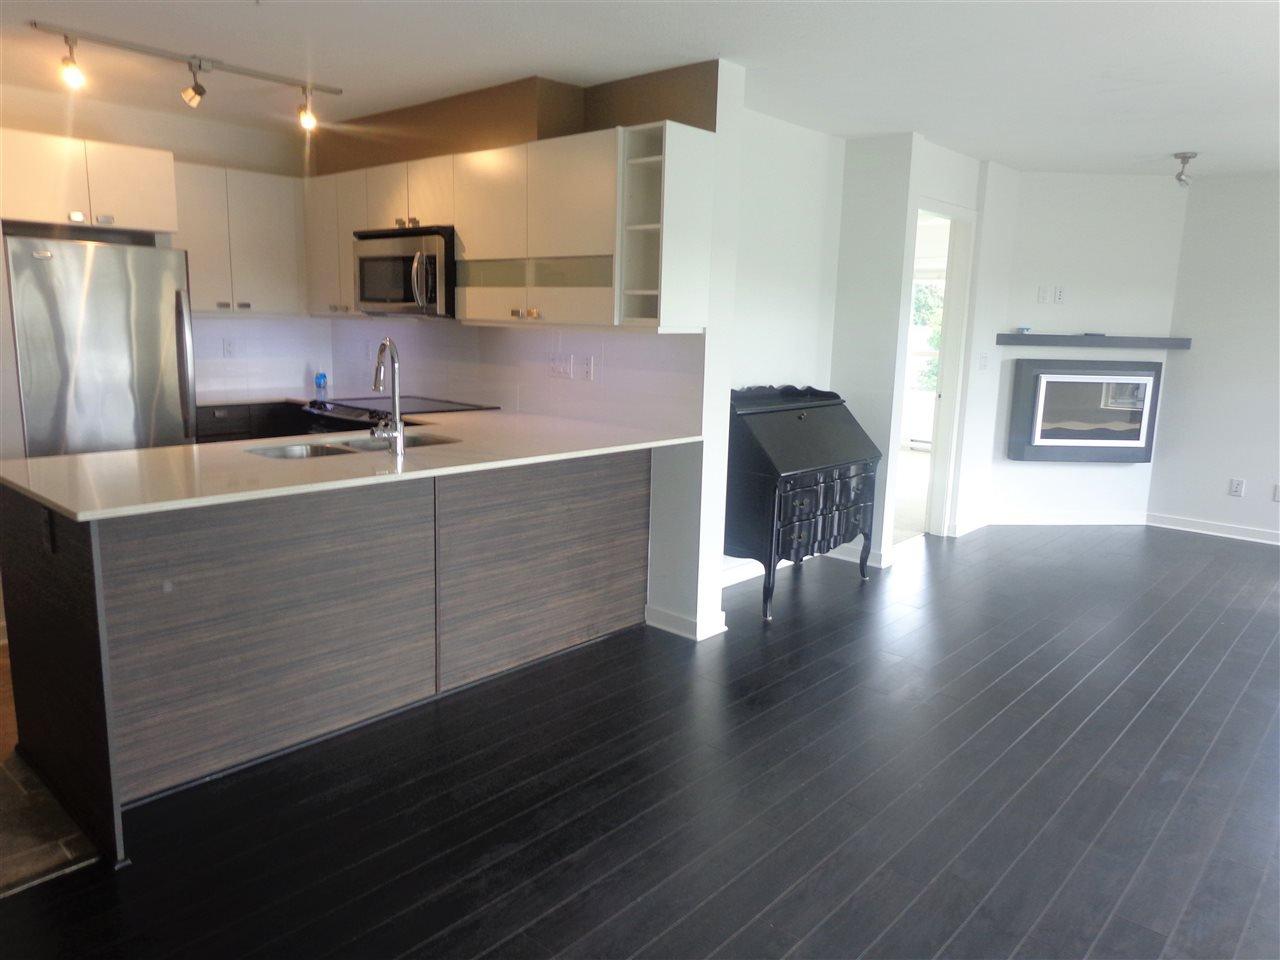 "Photo 8: Photos: 321 21009 56 Avenue in Langley: Salmon River Condo for sale in ""CORNERSTONE"" : MLS®# R2409598"